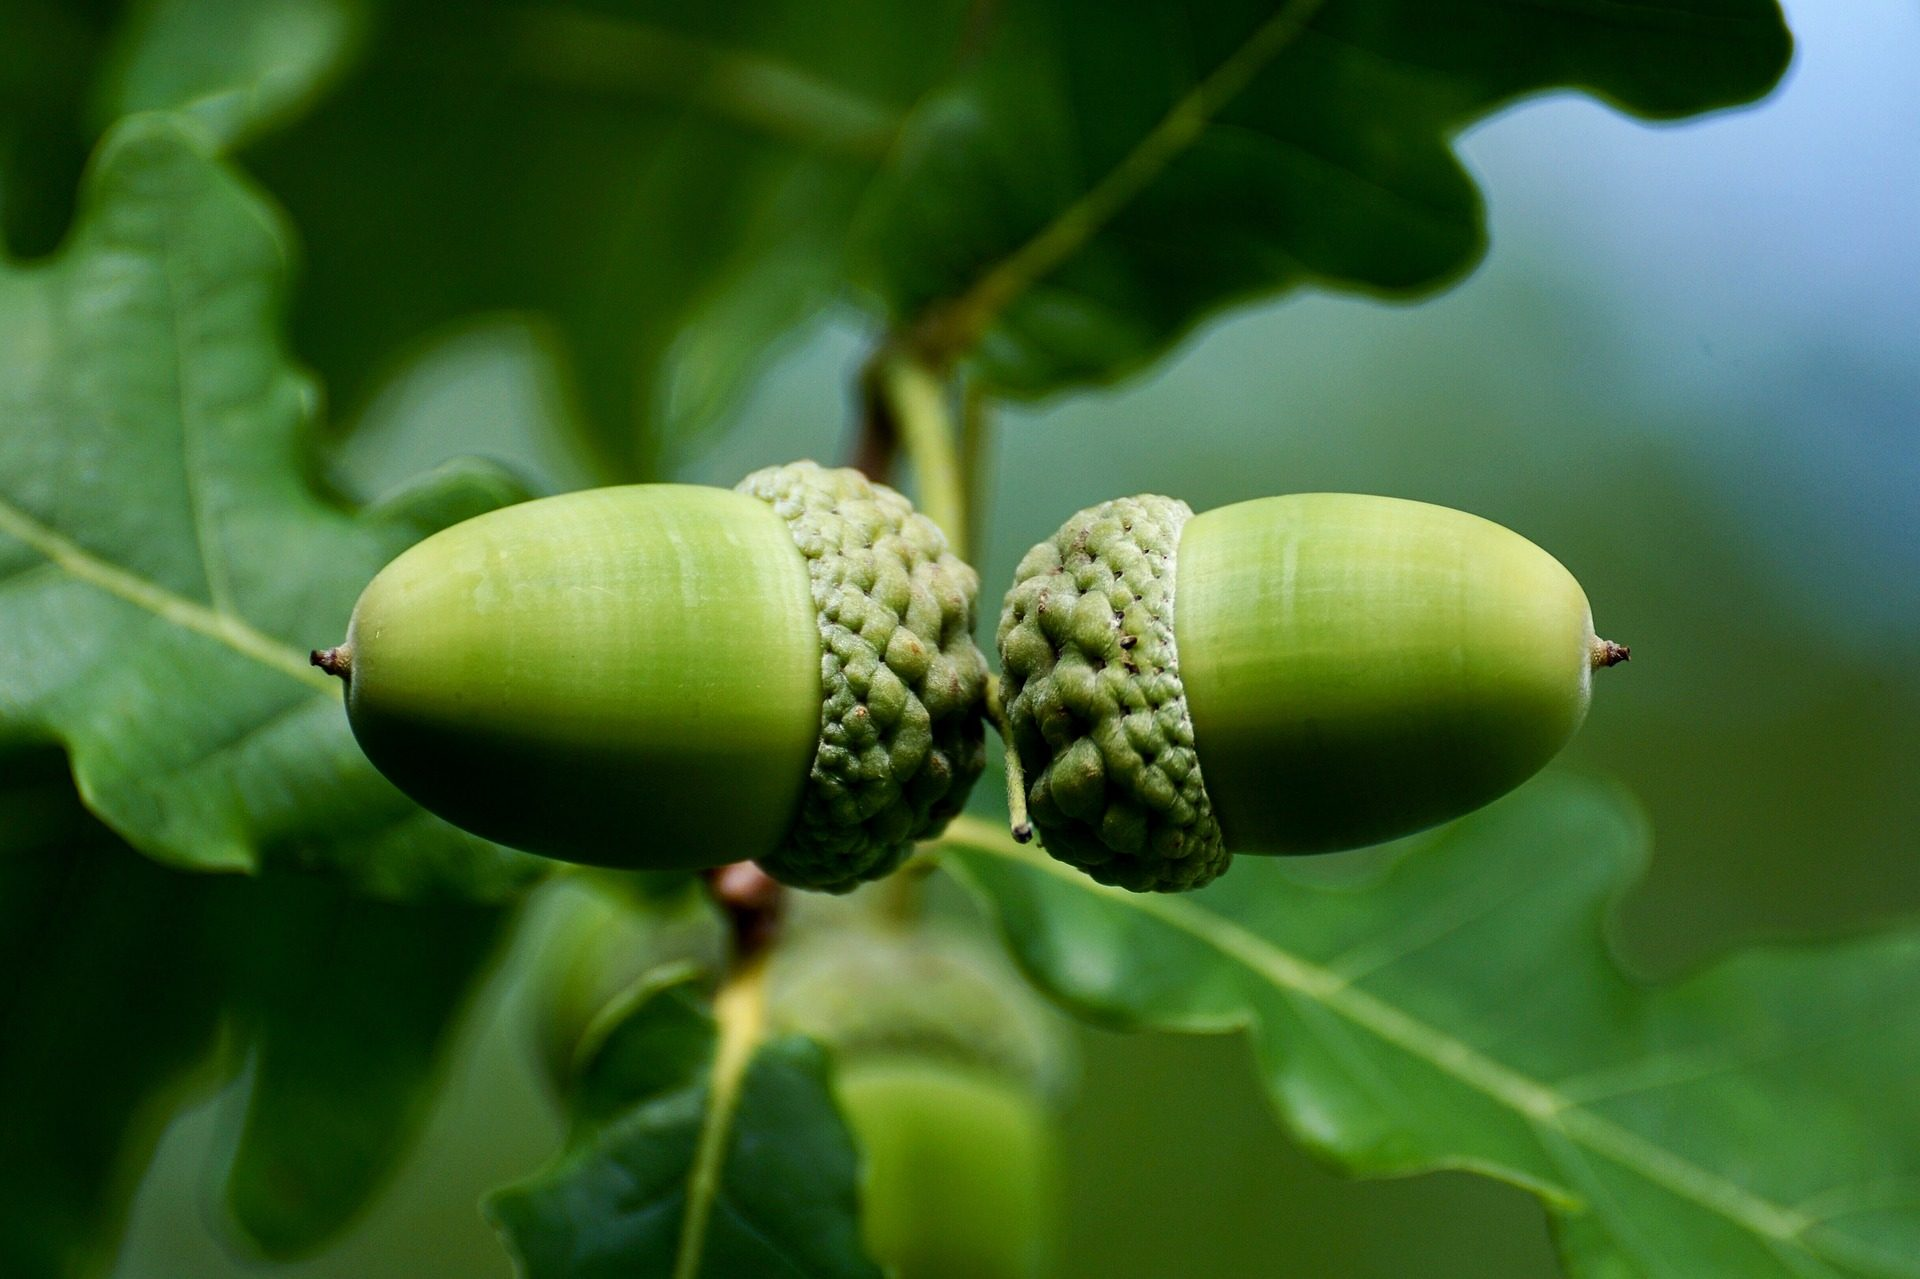 Bolotas, frutas, conchas, árvore, filial, Encina - Papéis de parede HD - Professor-falken.com